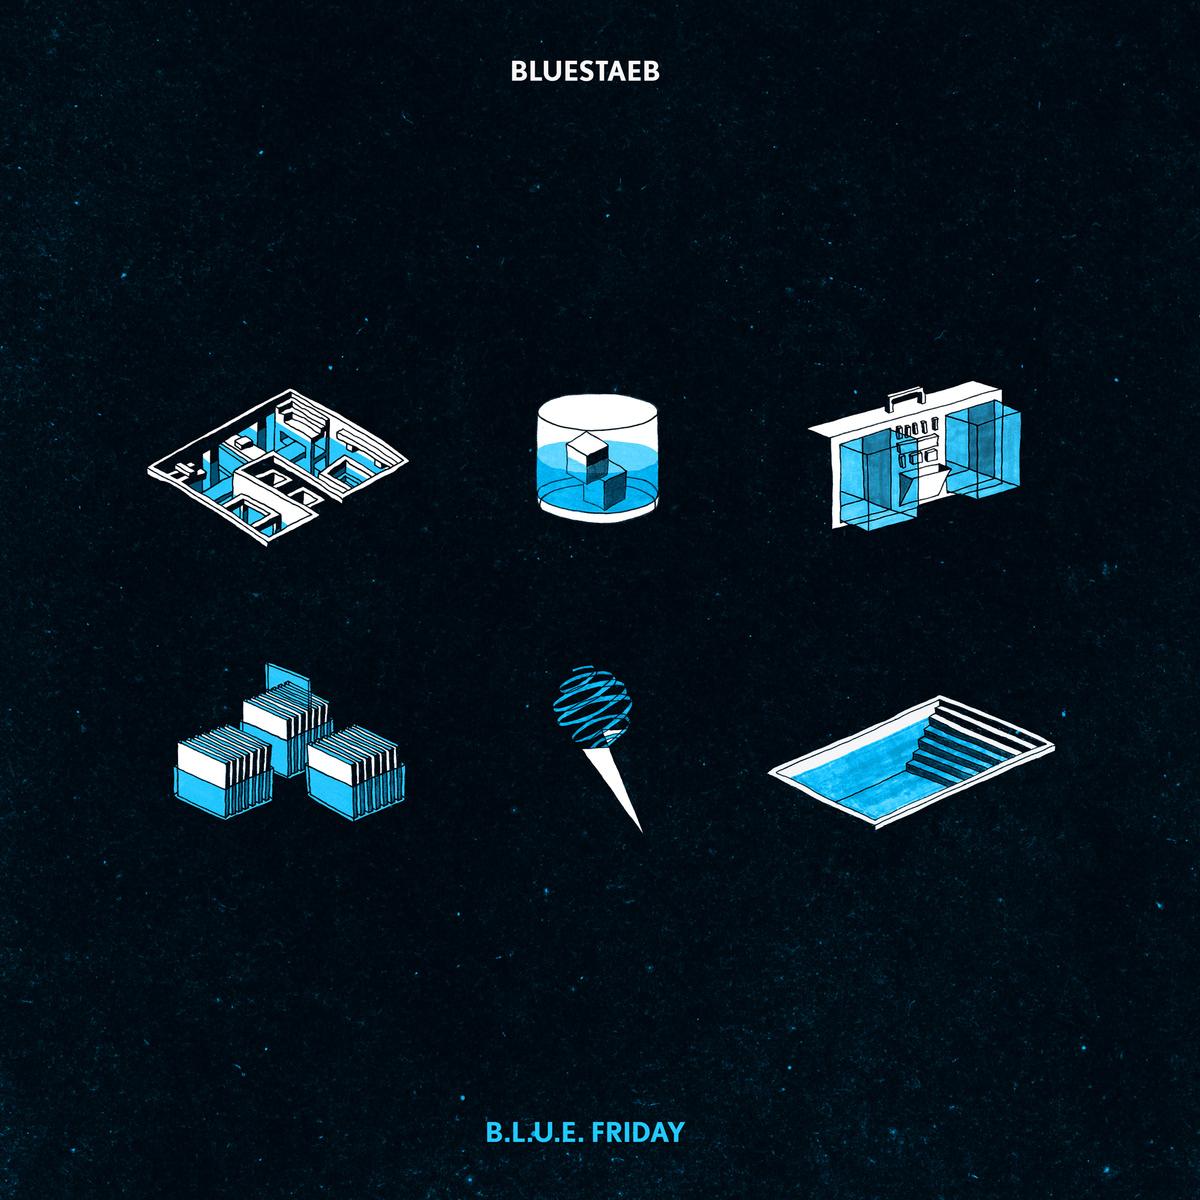 Bluestaeb – B.L.U.E Friday